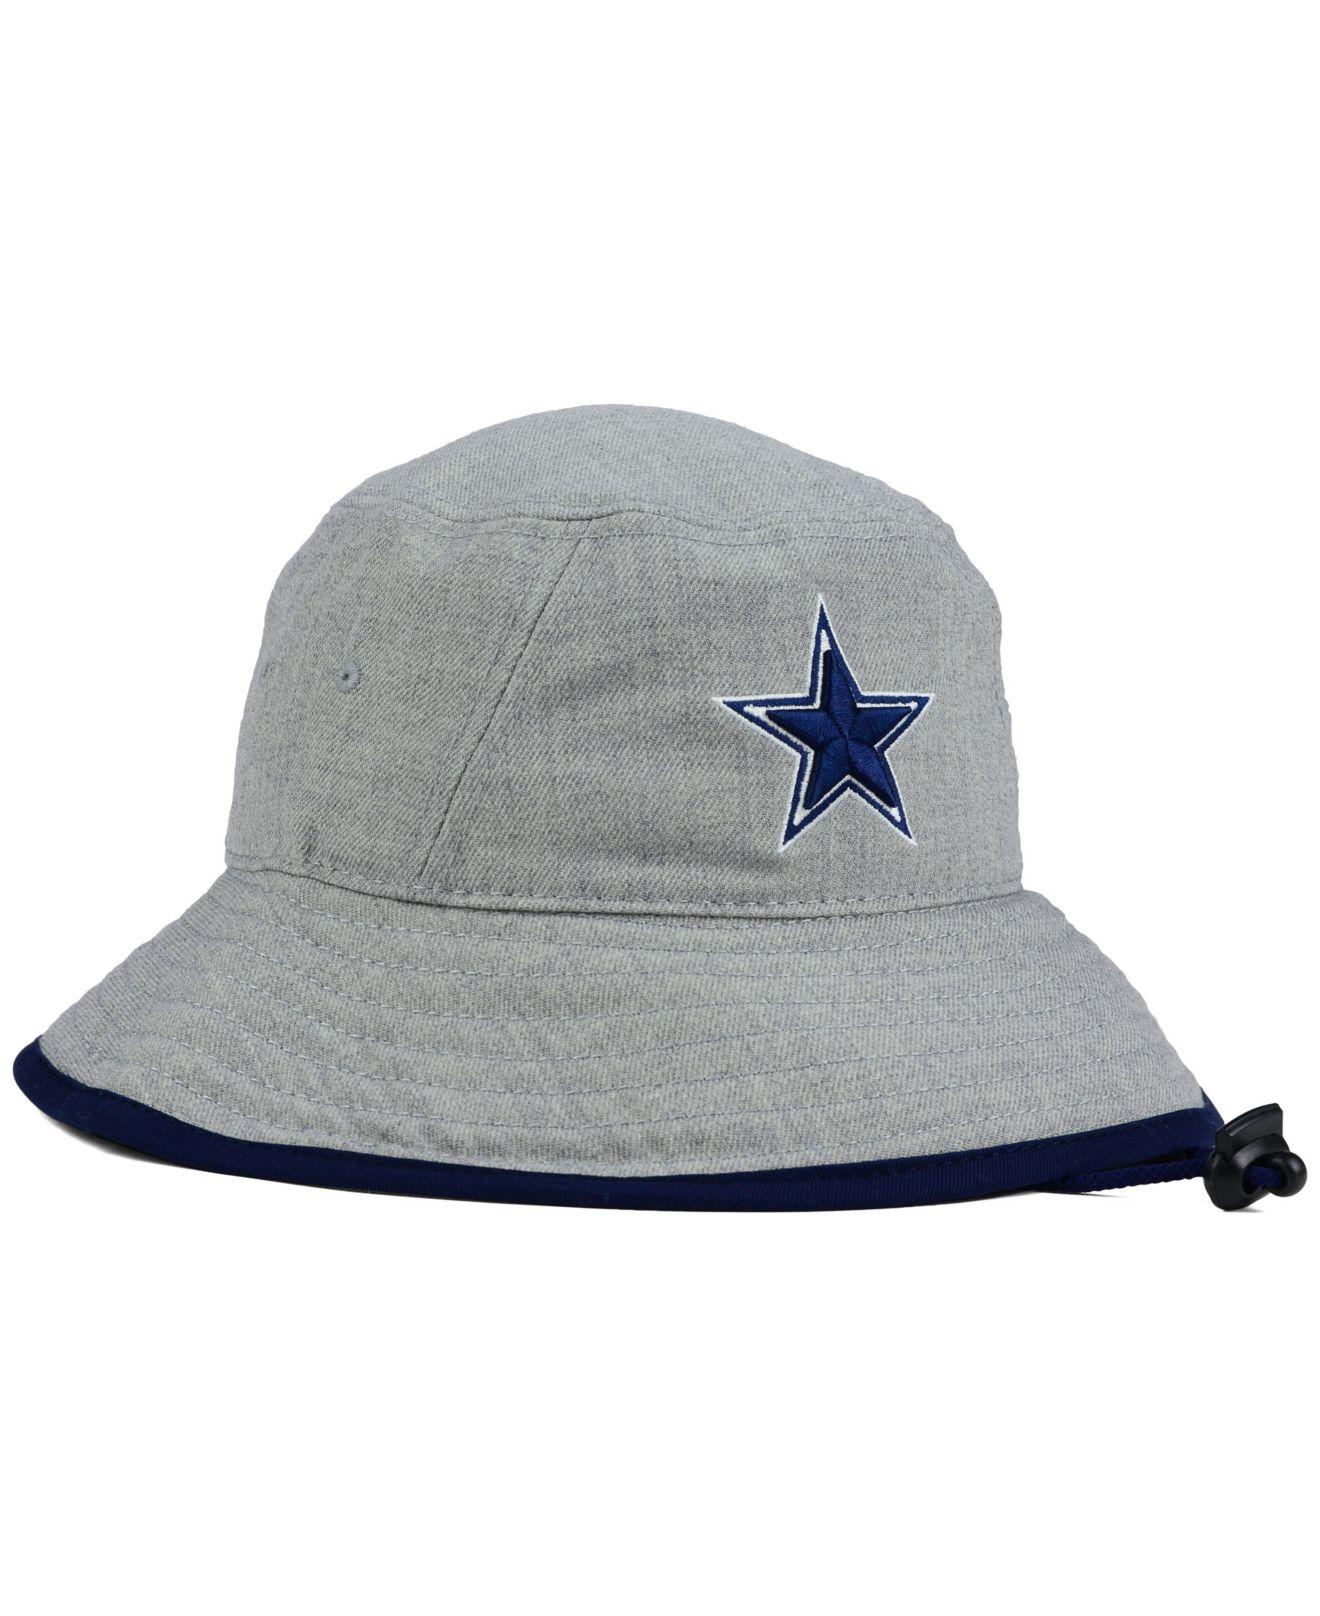 613b97f3c88 Lyst - KTZ Dallas Cowboys Nfl Heather Gray Bucket Hat in Gray for Men